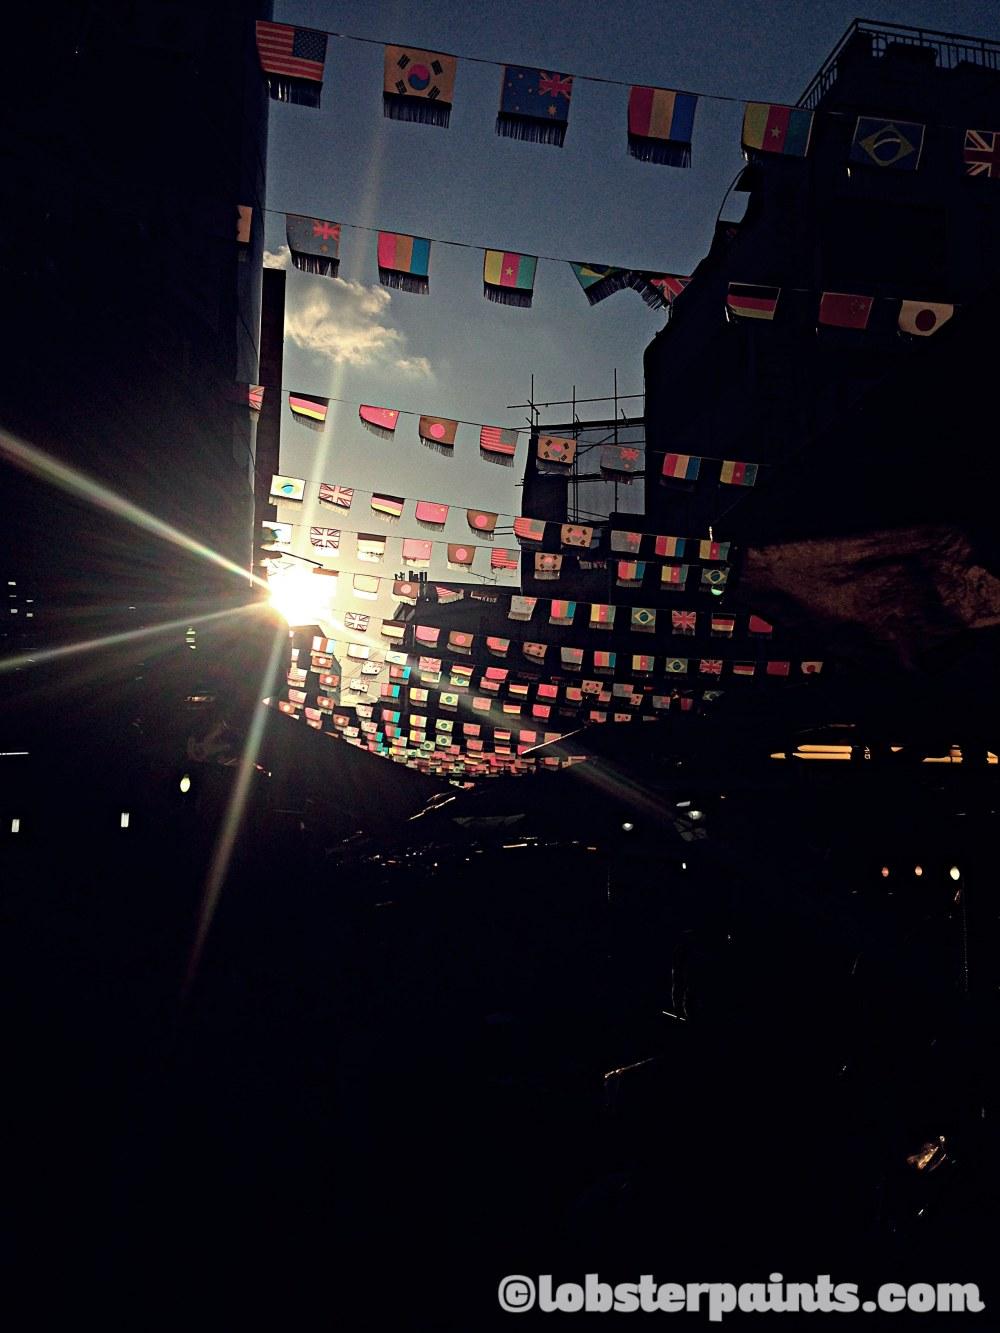 3 Oct 2014: Namdaemun Market 남대문시장 | Seoul, South Korea